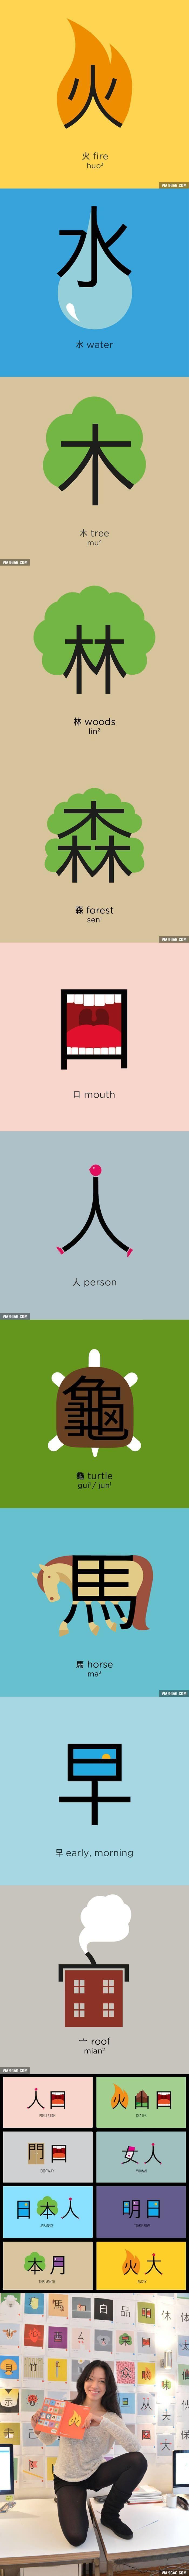 kanji #easyjapaneselanguage